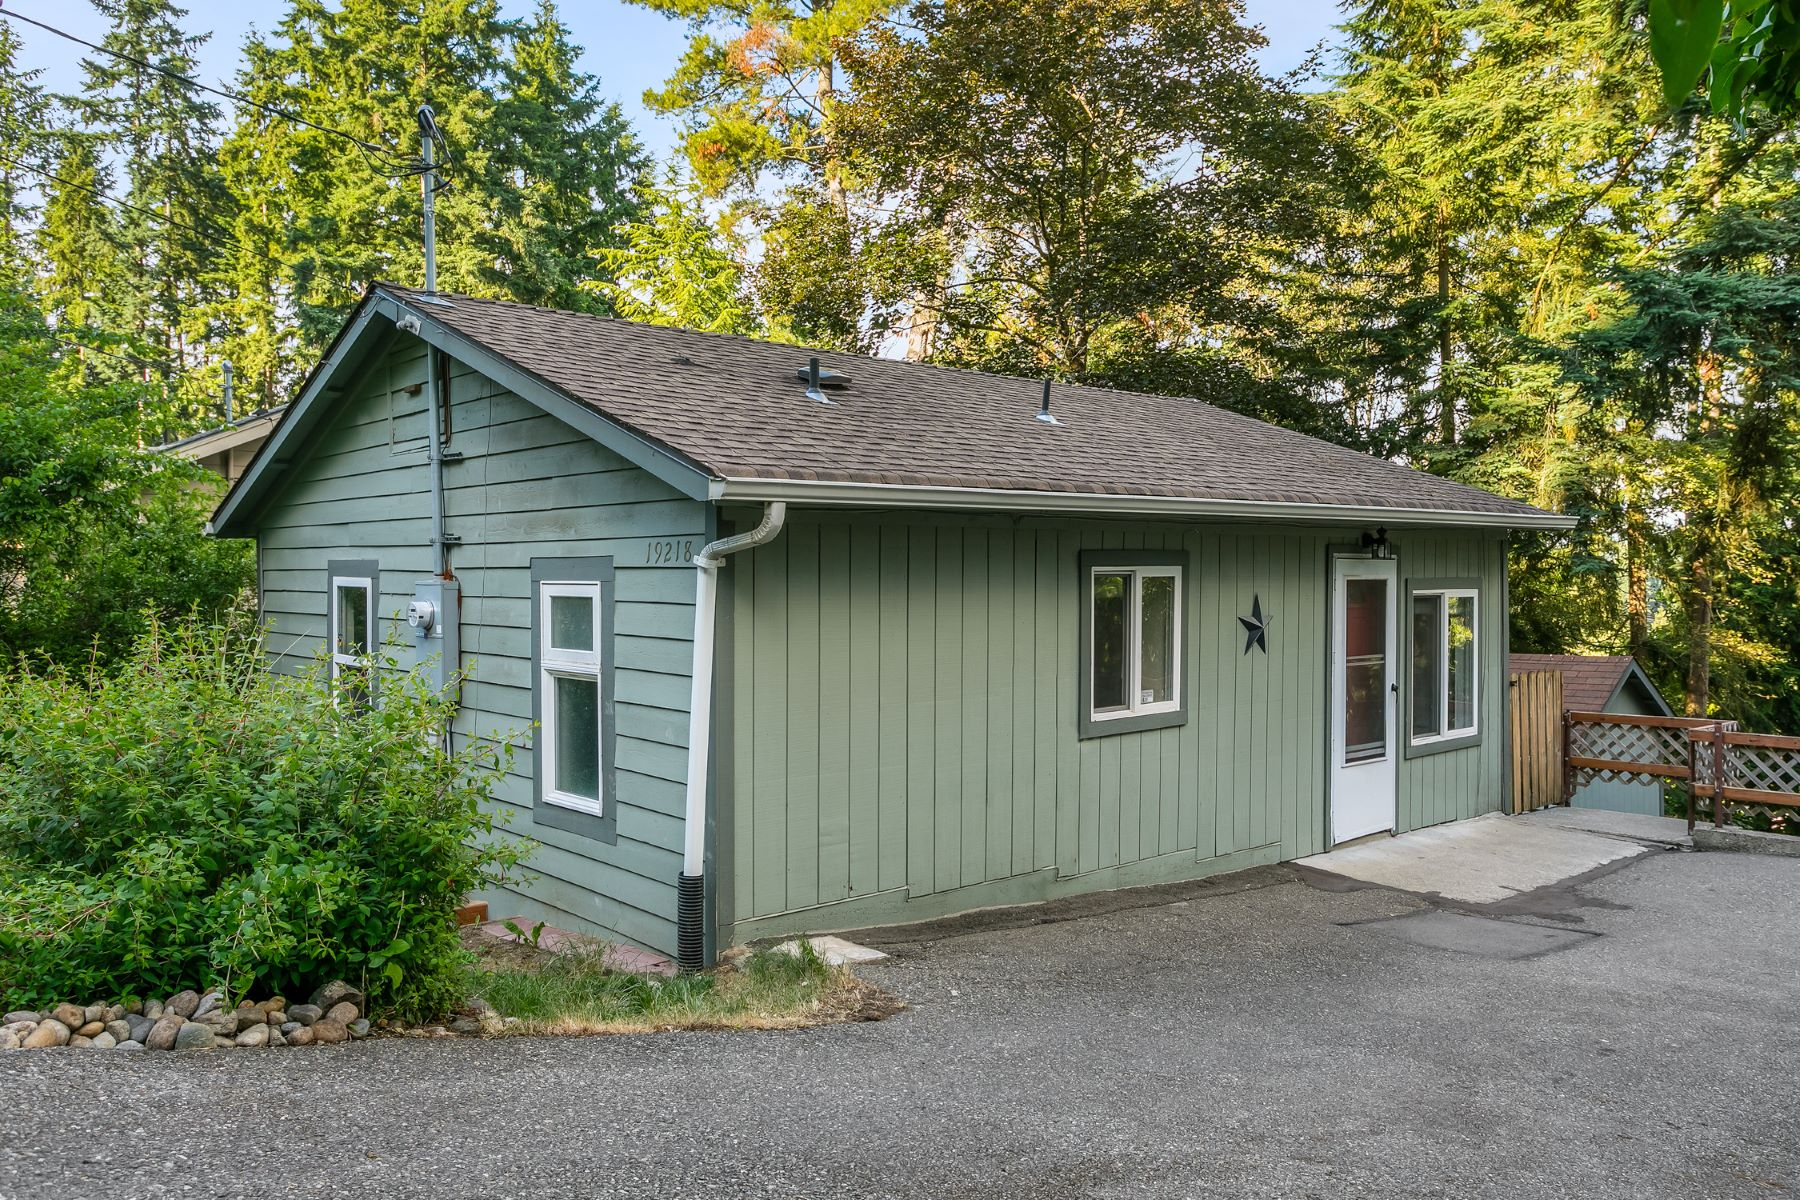 Single Family Homes for Sale at Lago Vista 19218 12th Ave NE Shoreline, Washington 98155 United States